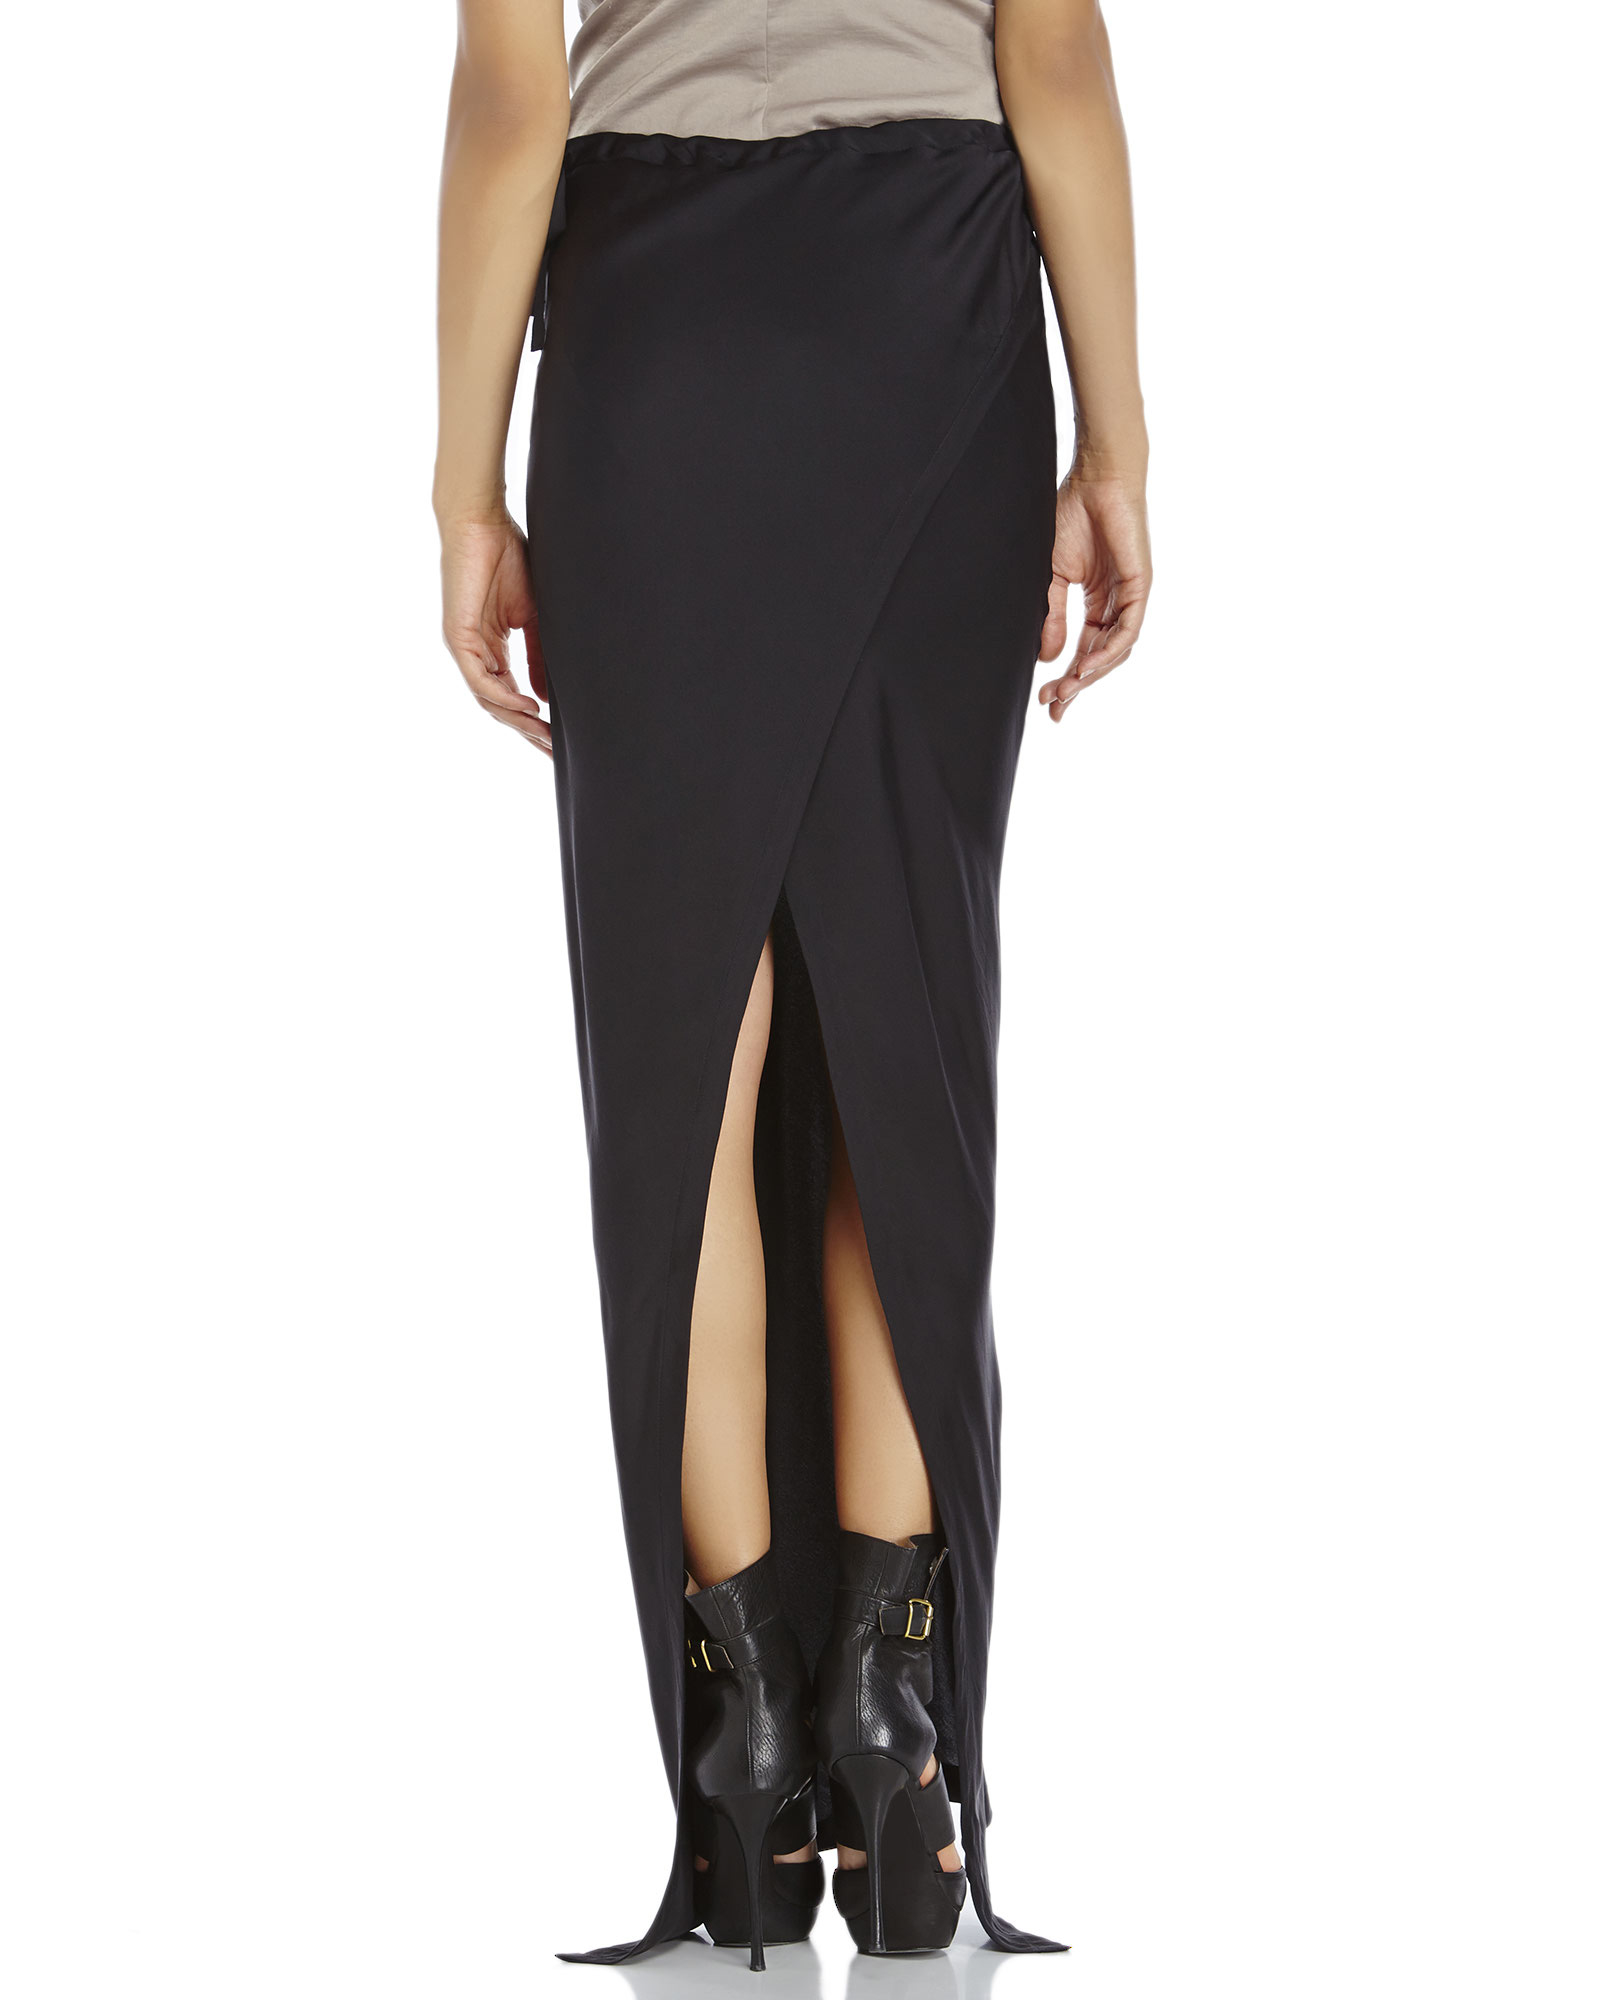 Ann demeulemeester Black Silk Maxi Skirt in Black | Lyst